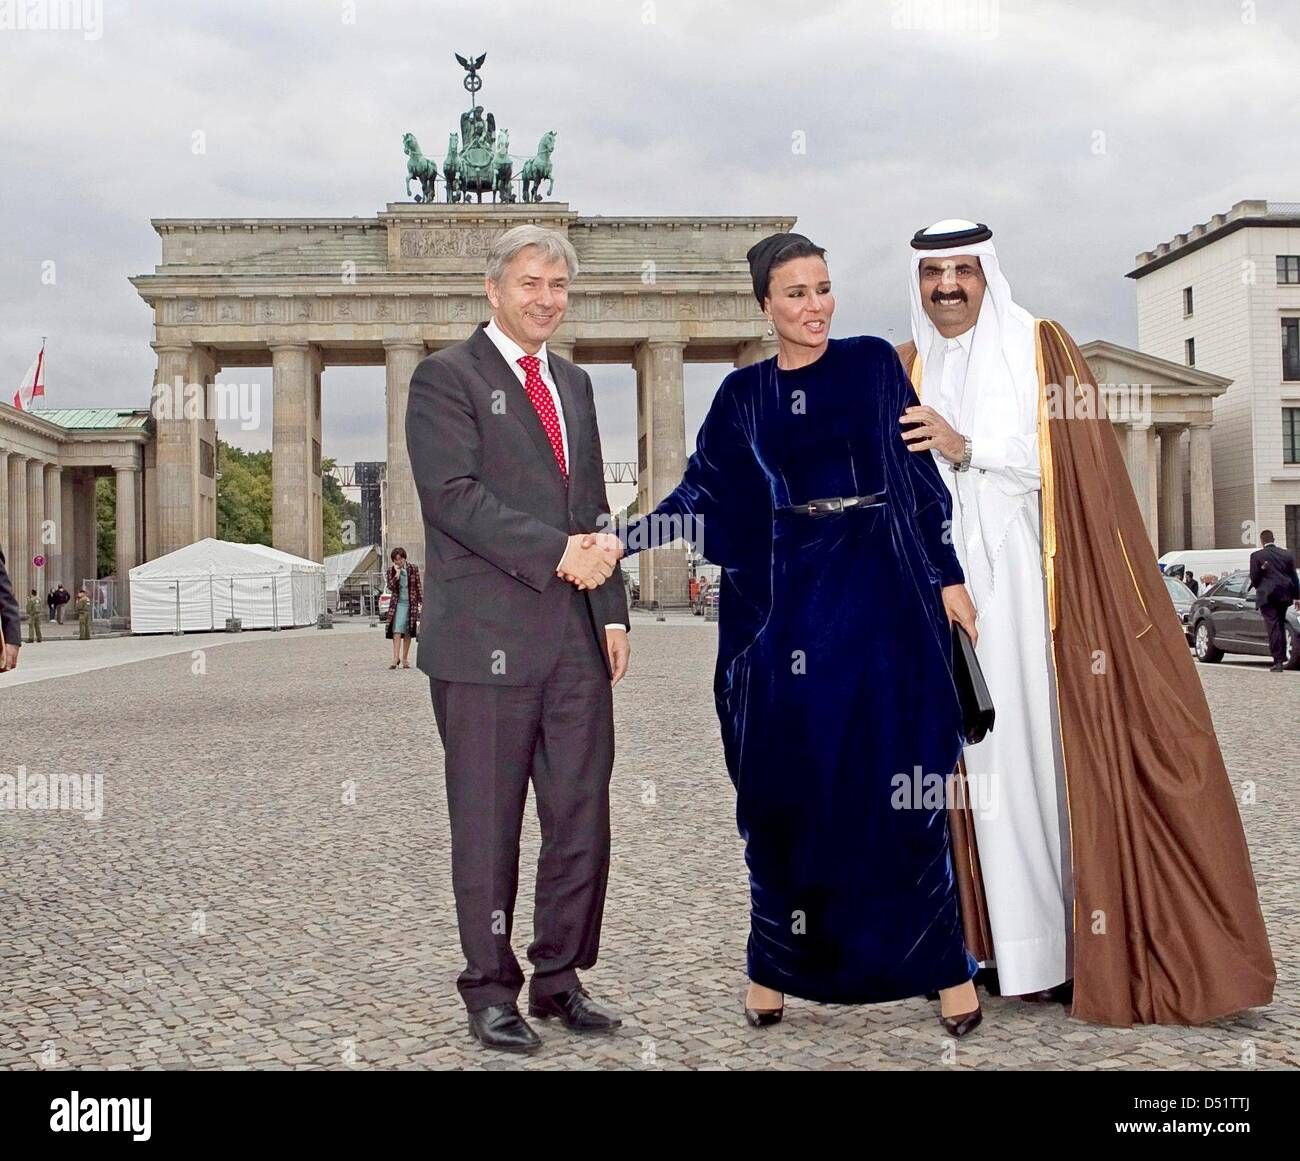 Major of Berlin, Klaus Wowereit (L), accompanies the Emir of the state of Qatar, Hamad bin Khalifa Al Thani, and Stock Photo